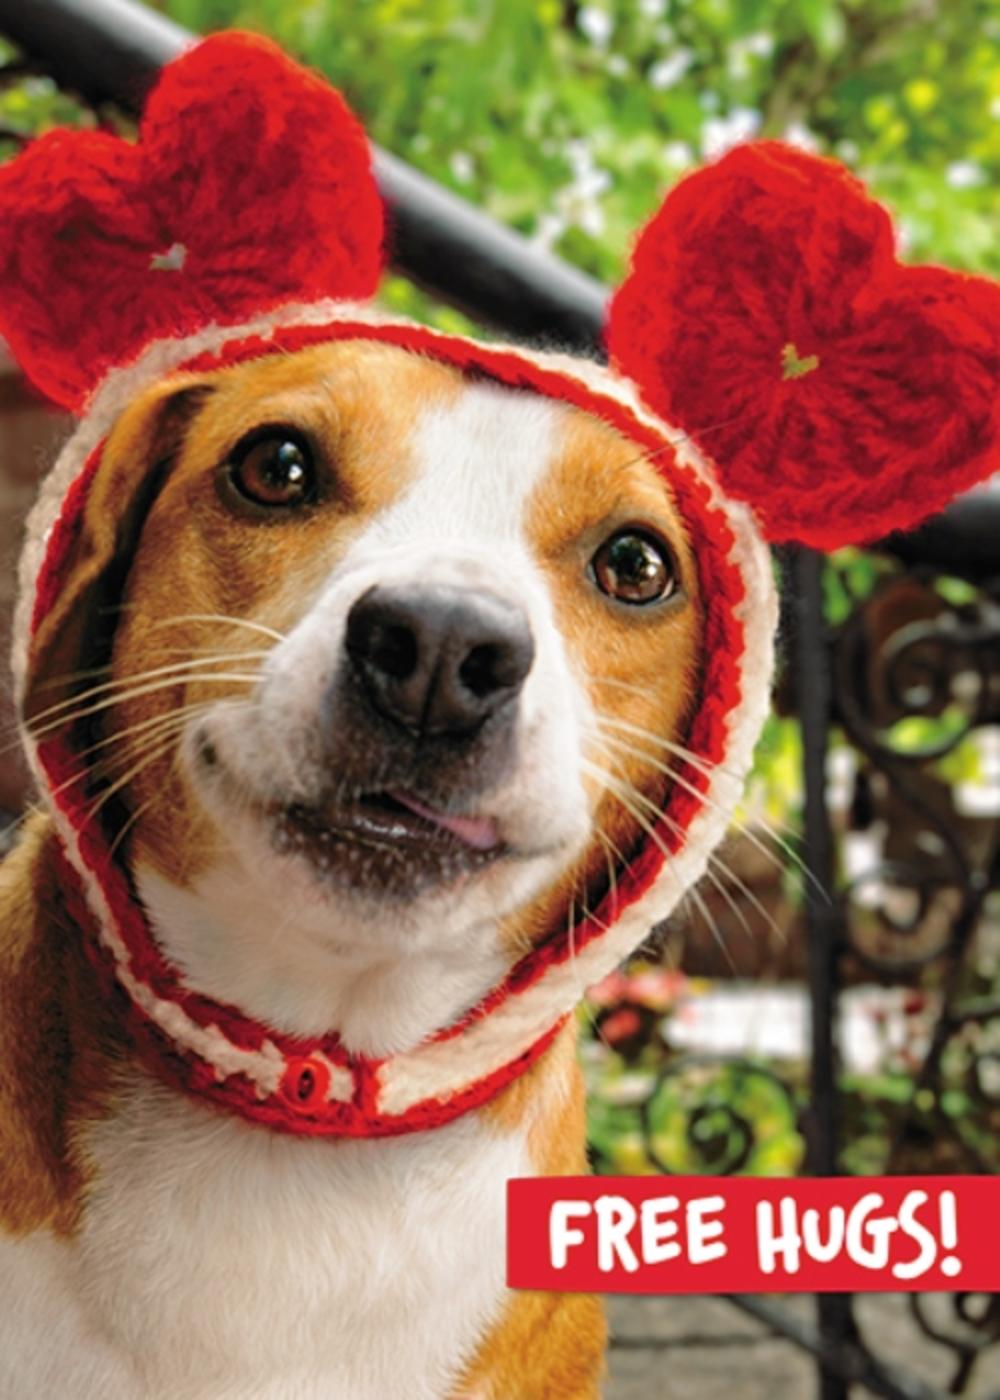 Avanti Valentine's Day Dog I Ruv You Greeting Card